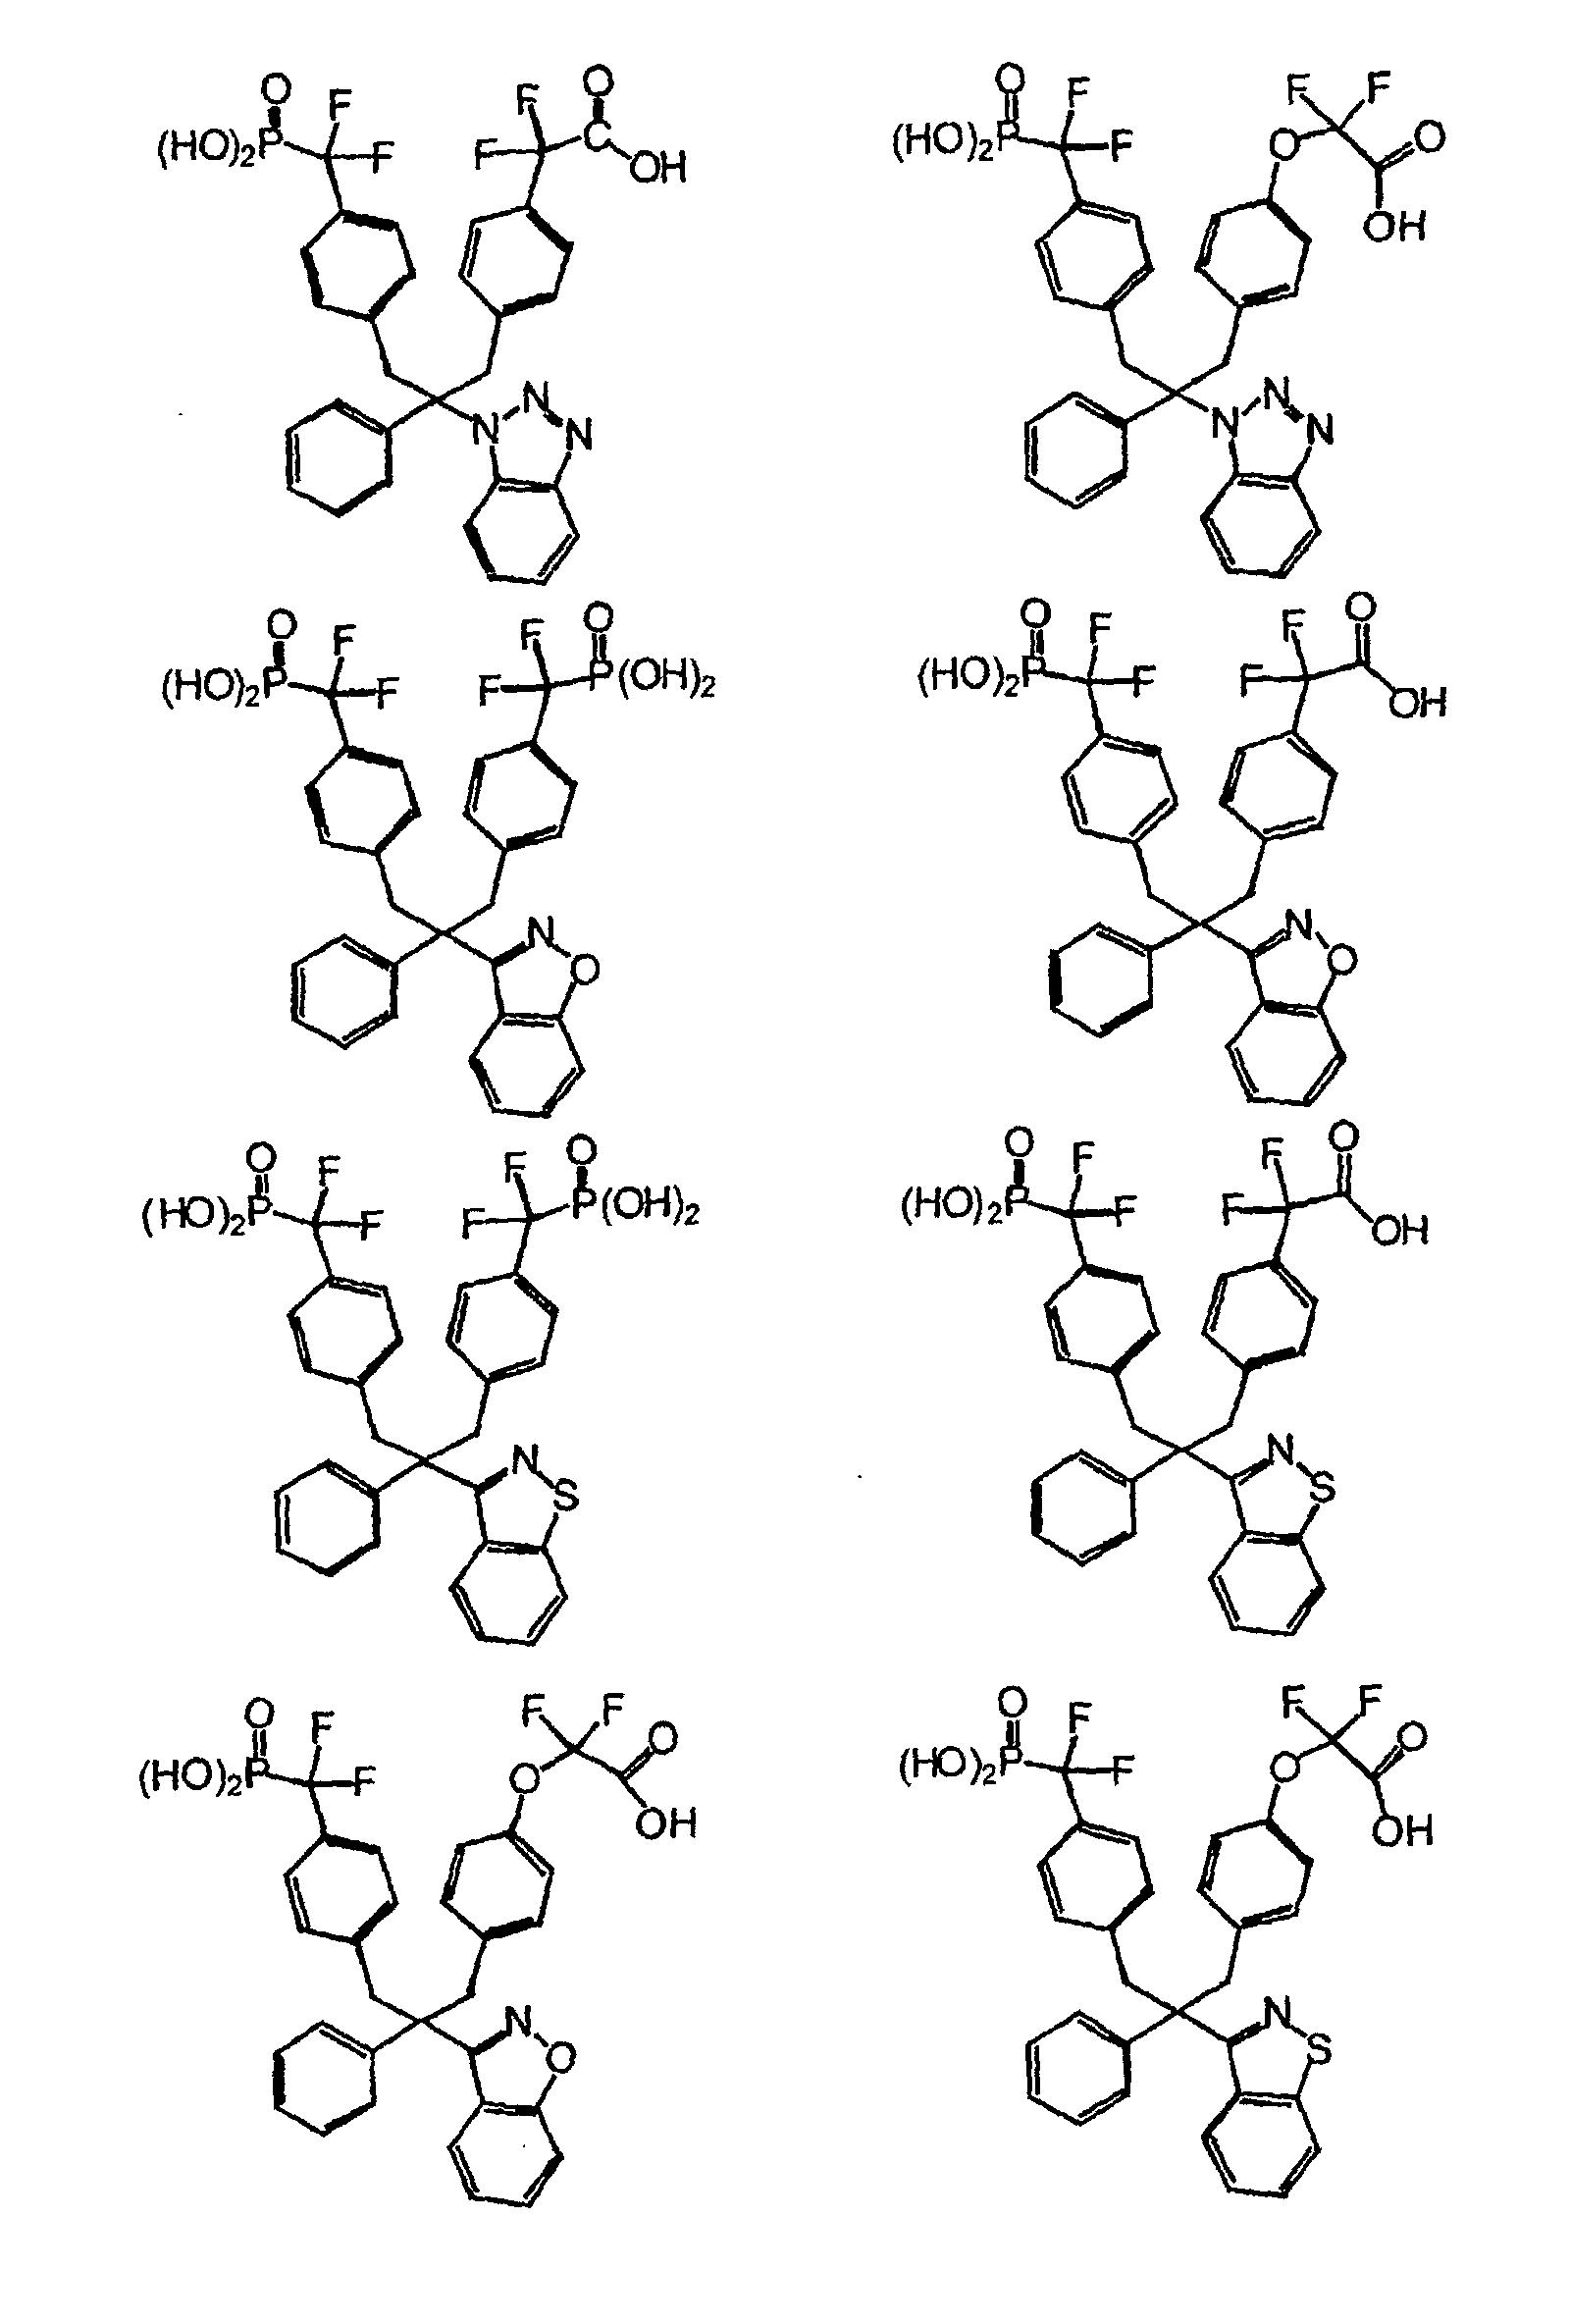 EP1115729B1 - Phosphonic acid derivatives as inhibitors of